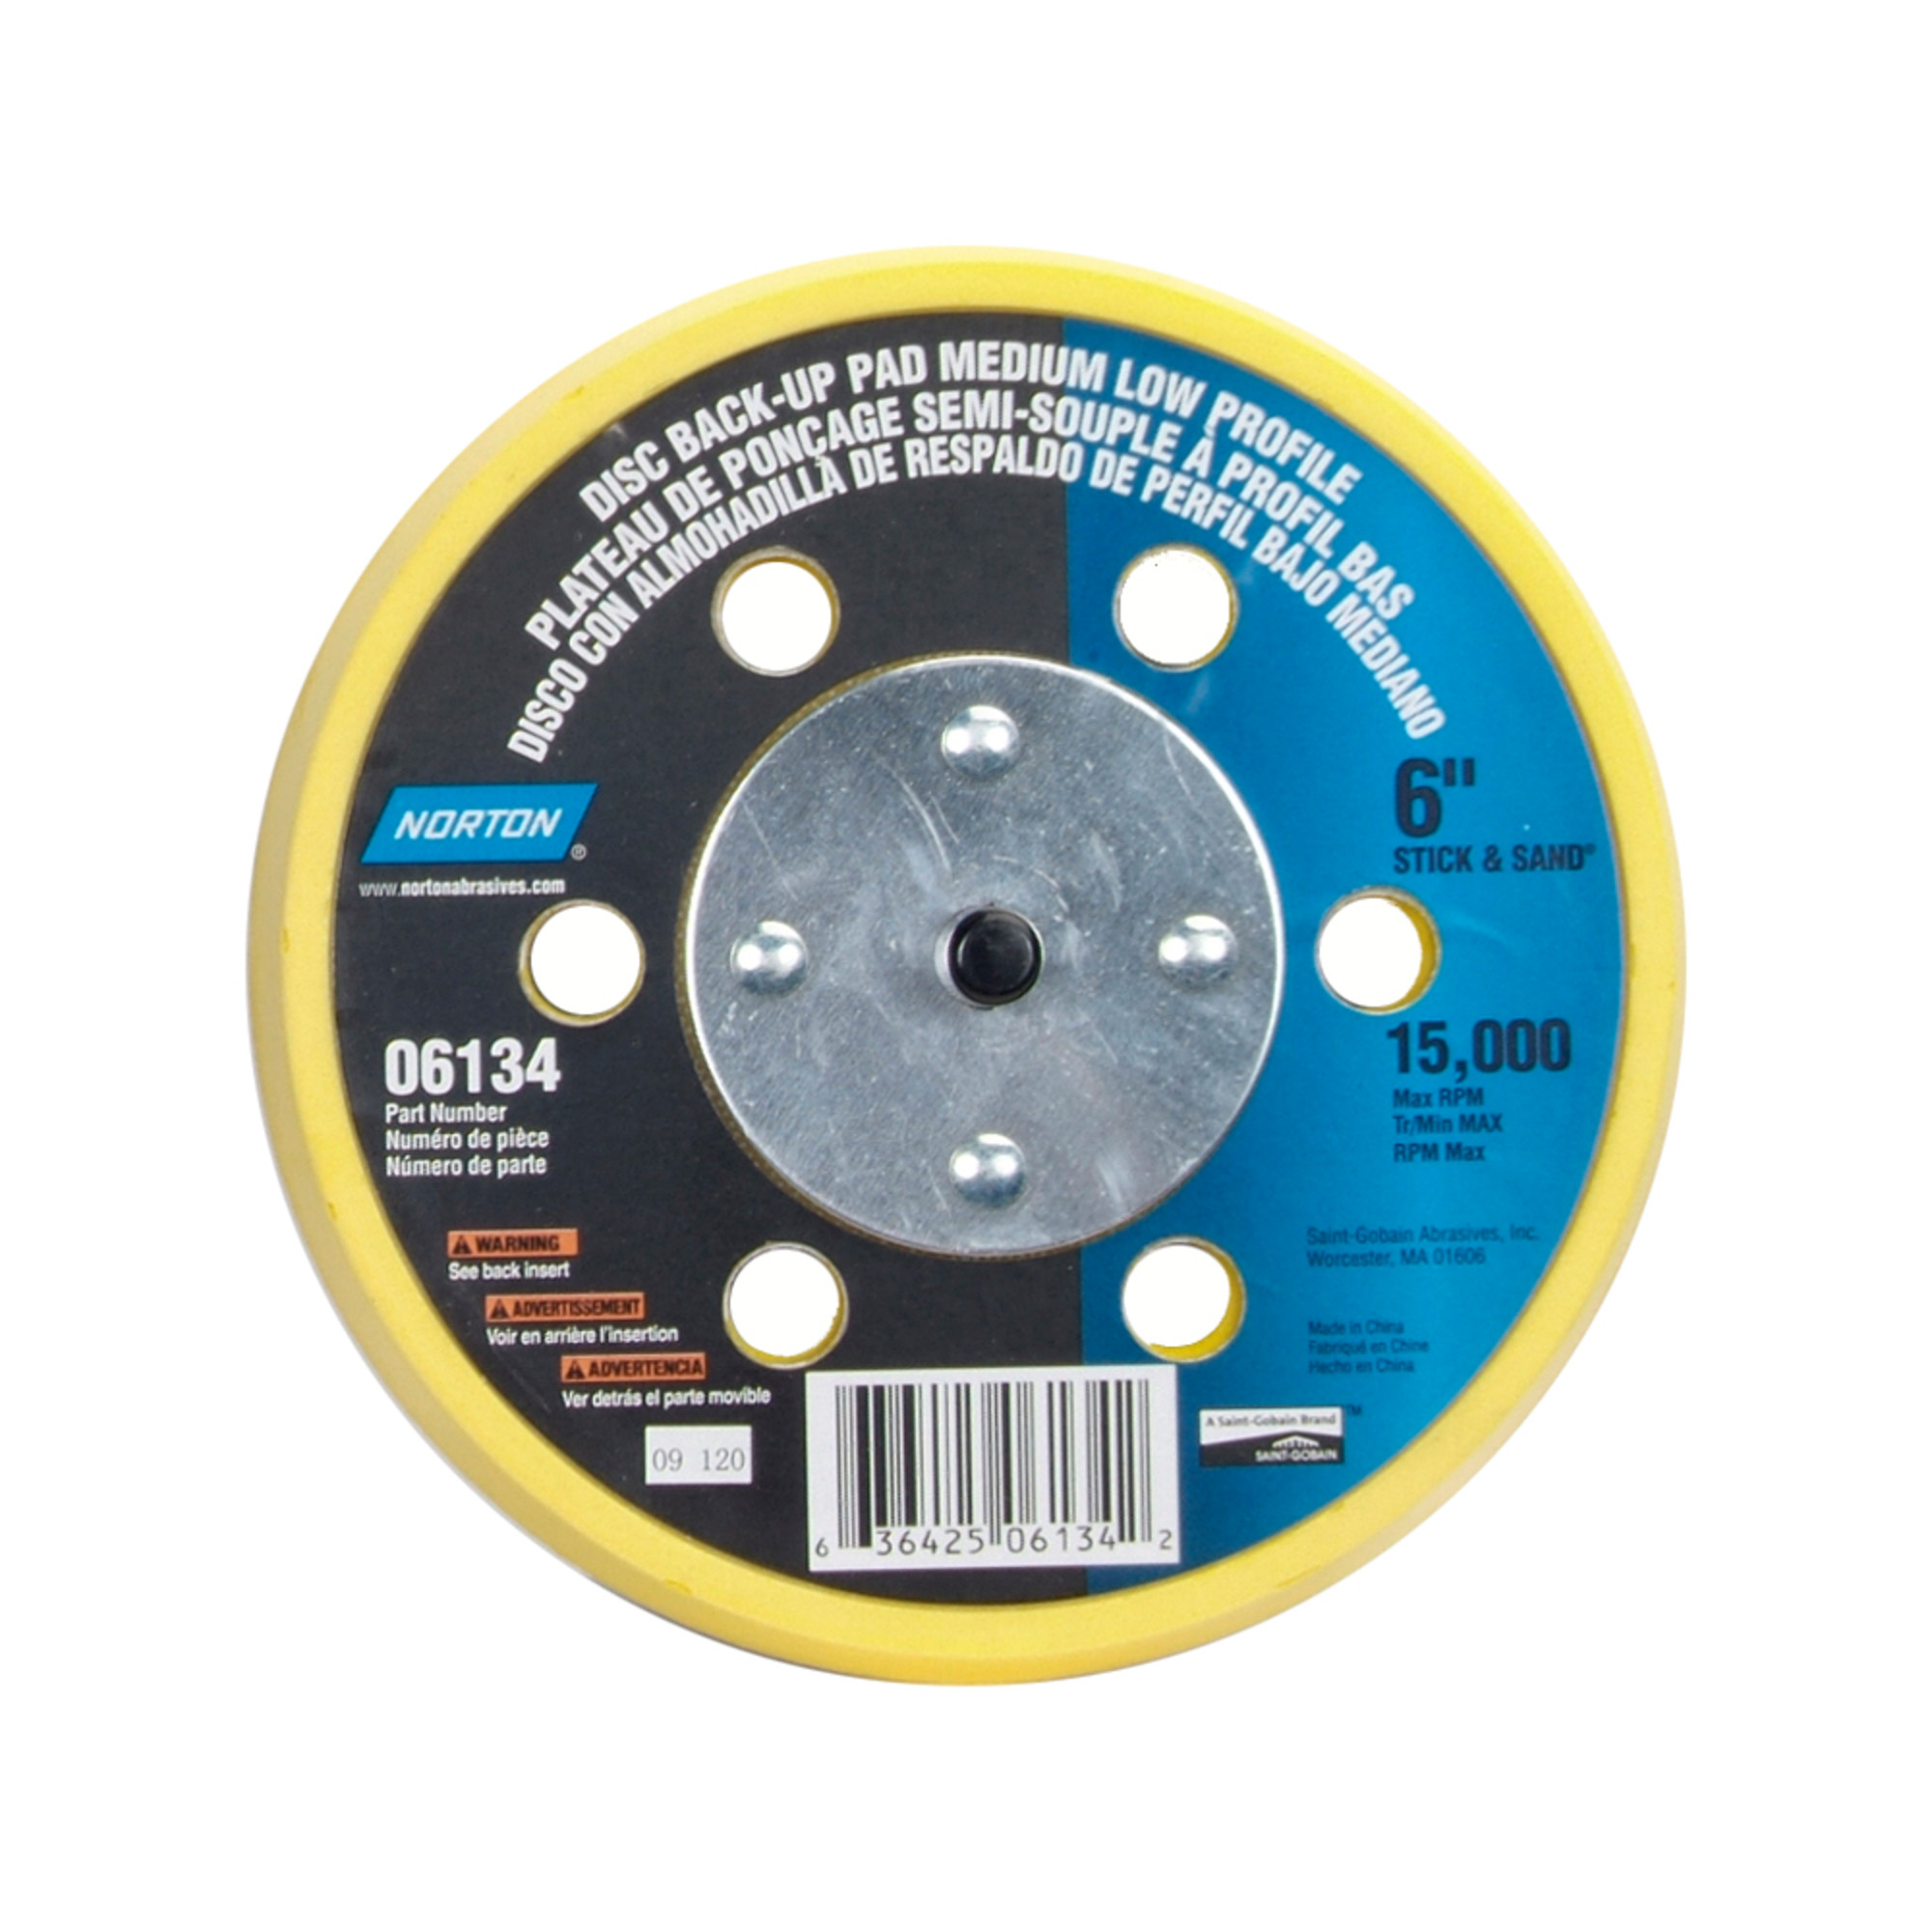 Norton 636425-00407 White 36 x 750 Polycoated Masking Paper